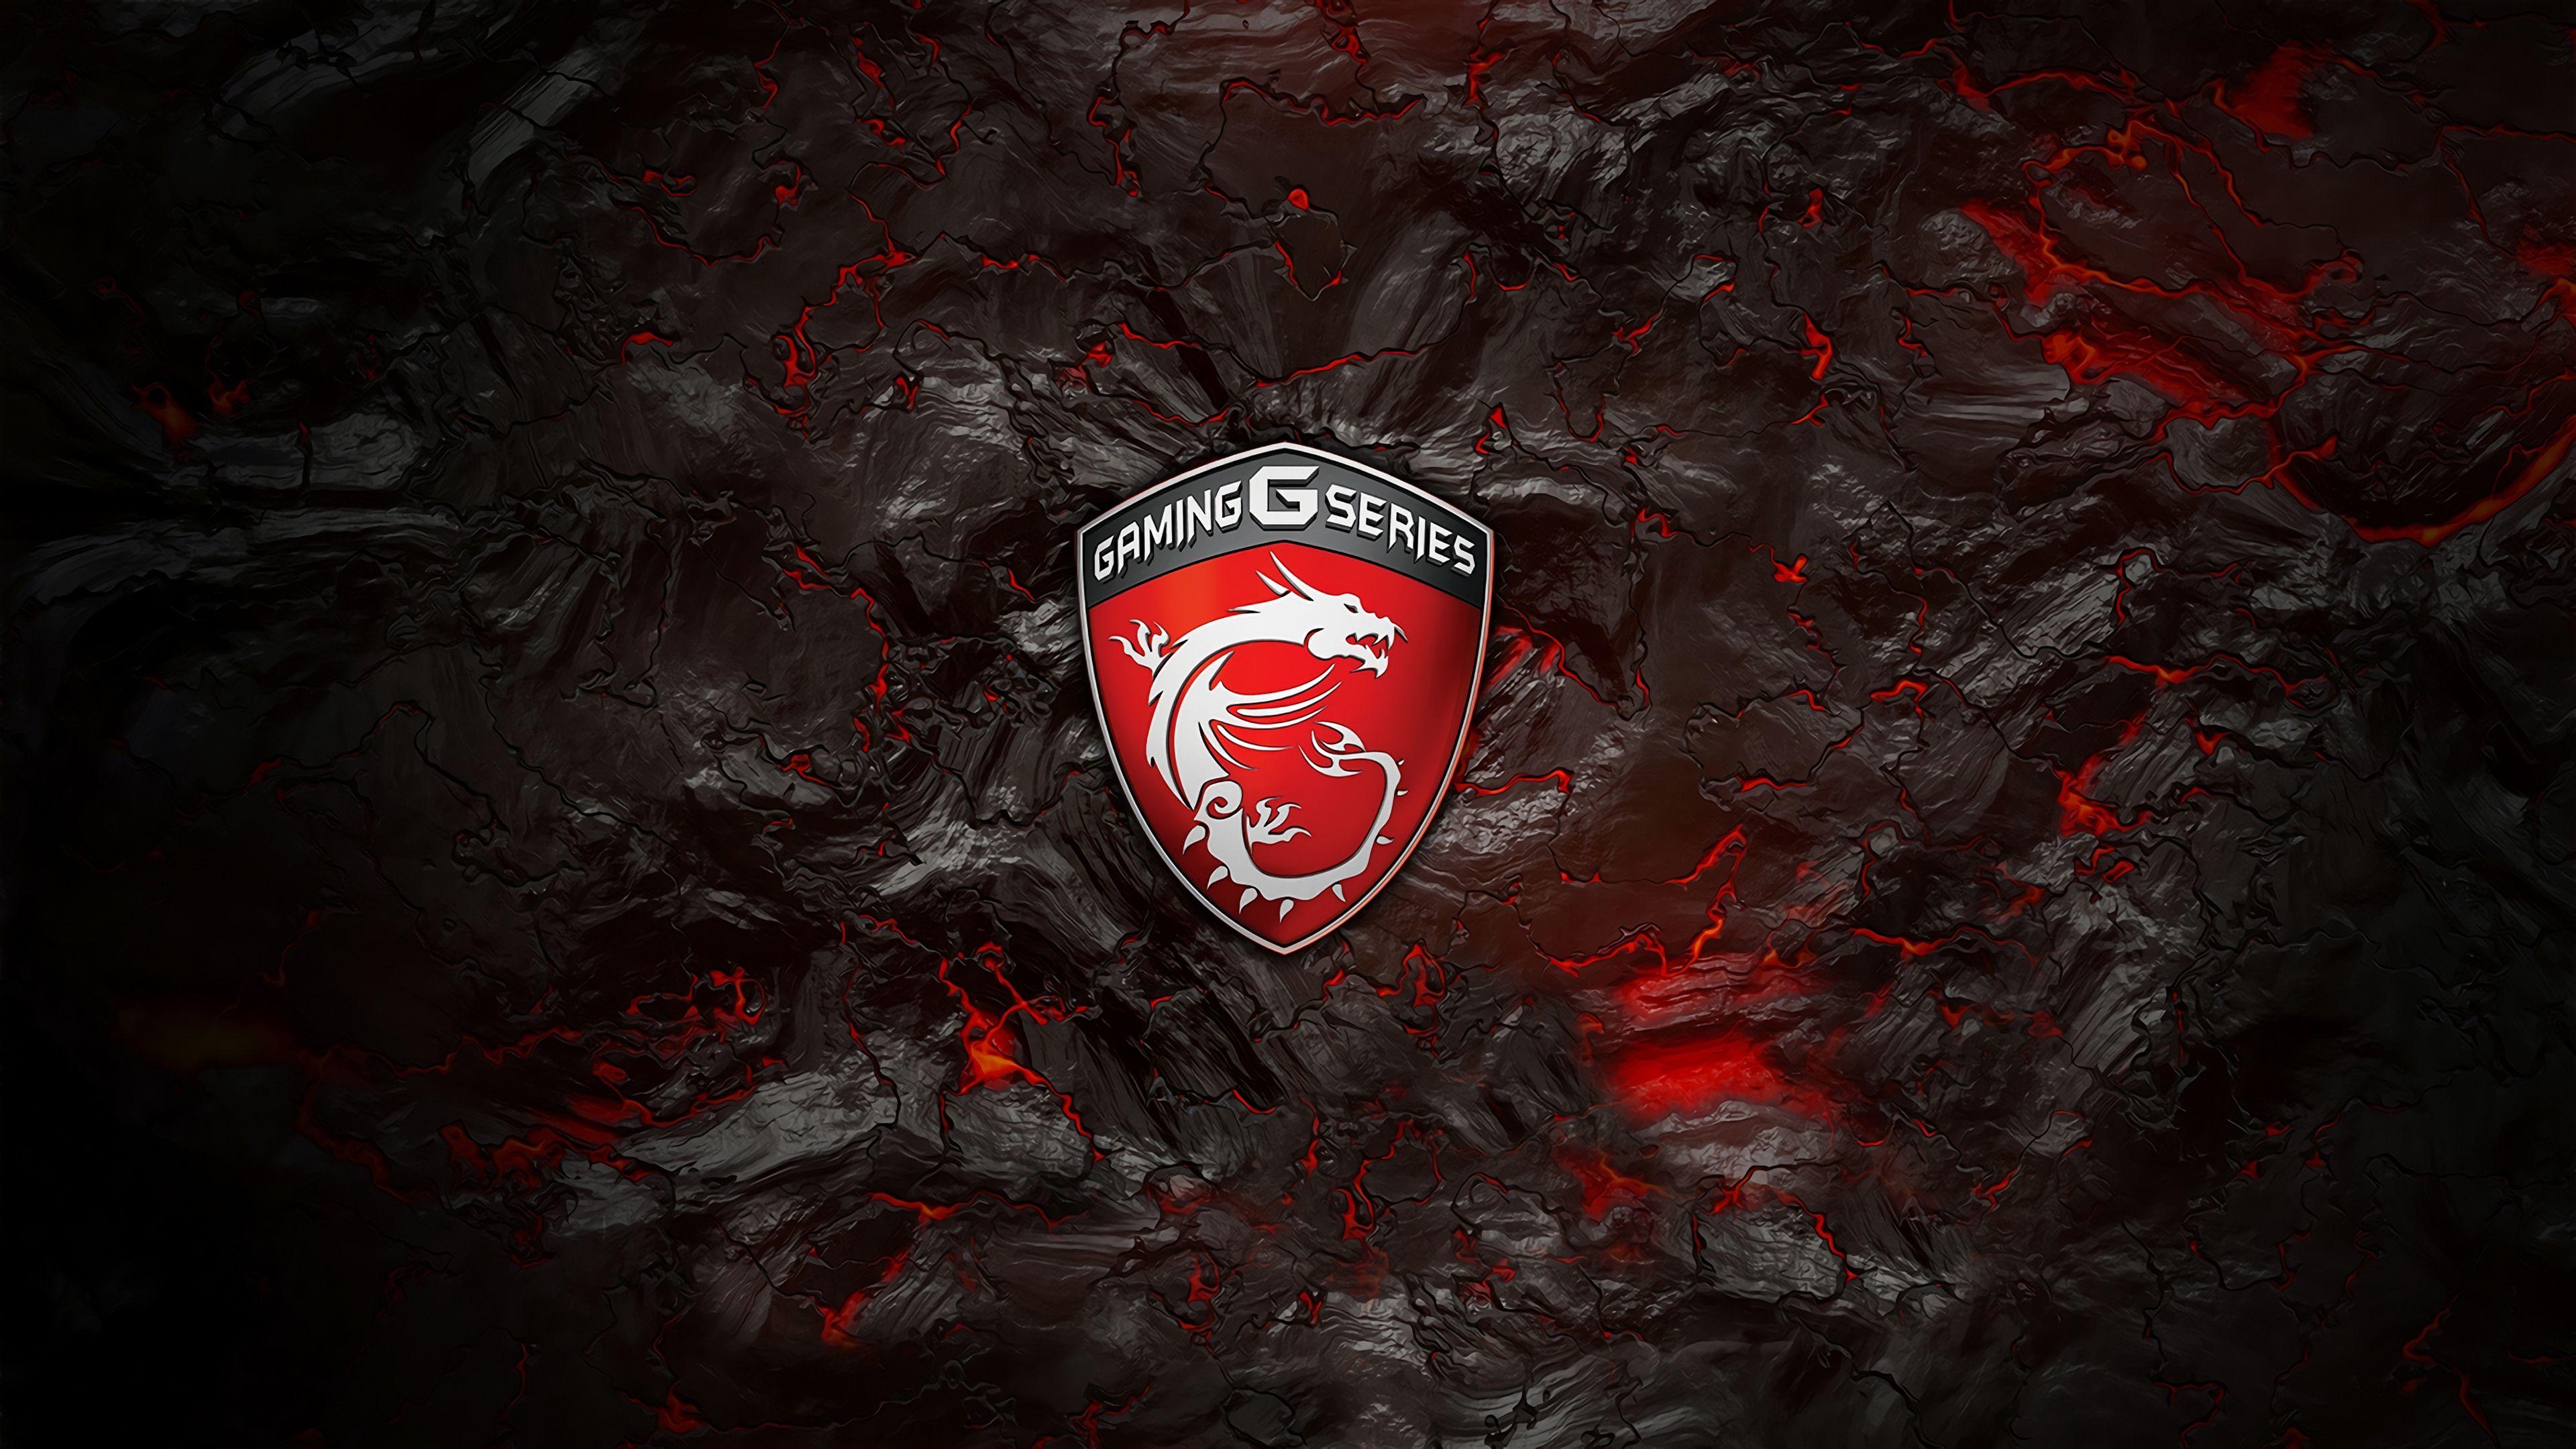 MSI Red Dragon 4K Wallpaper